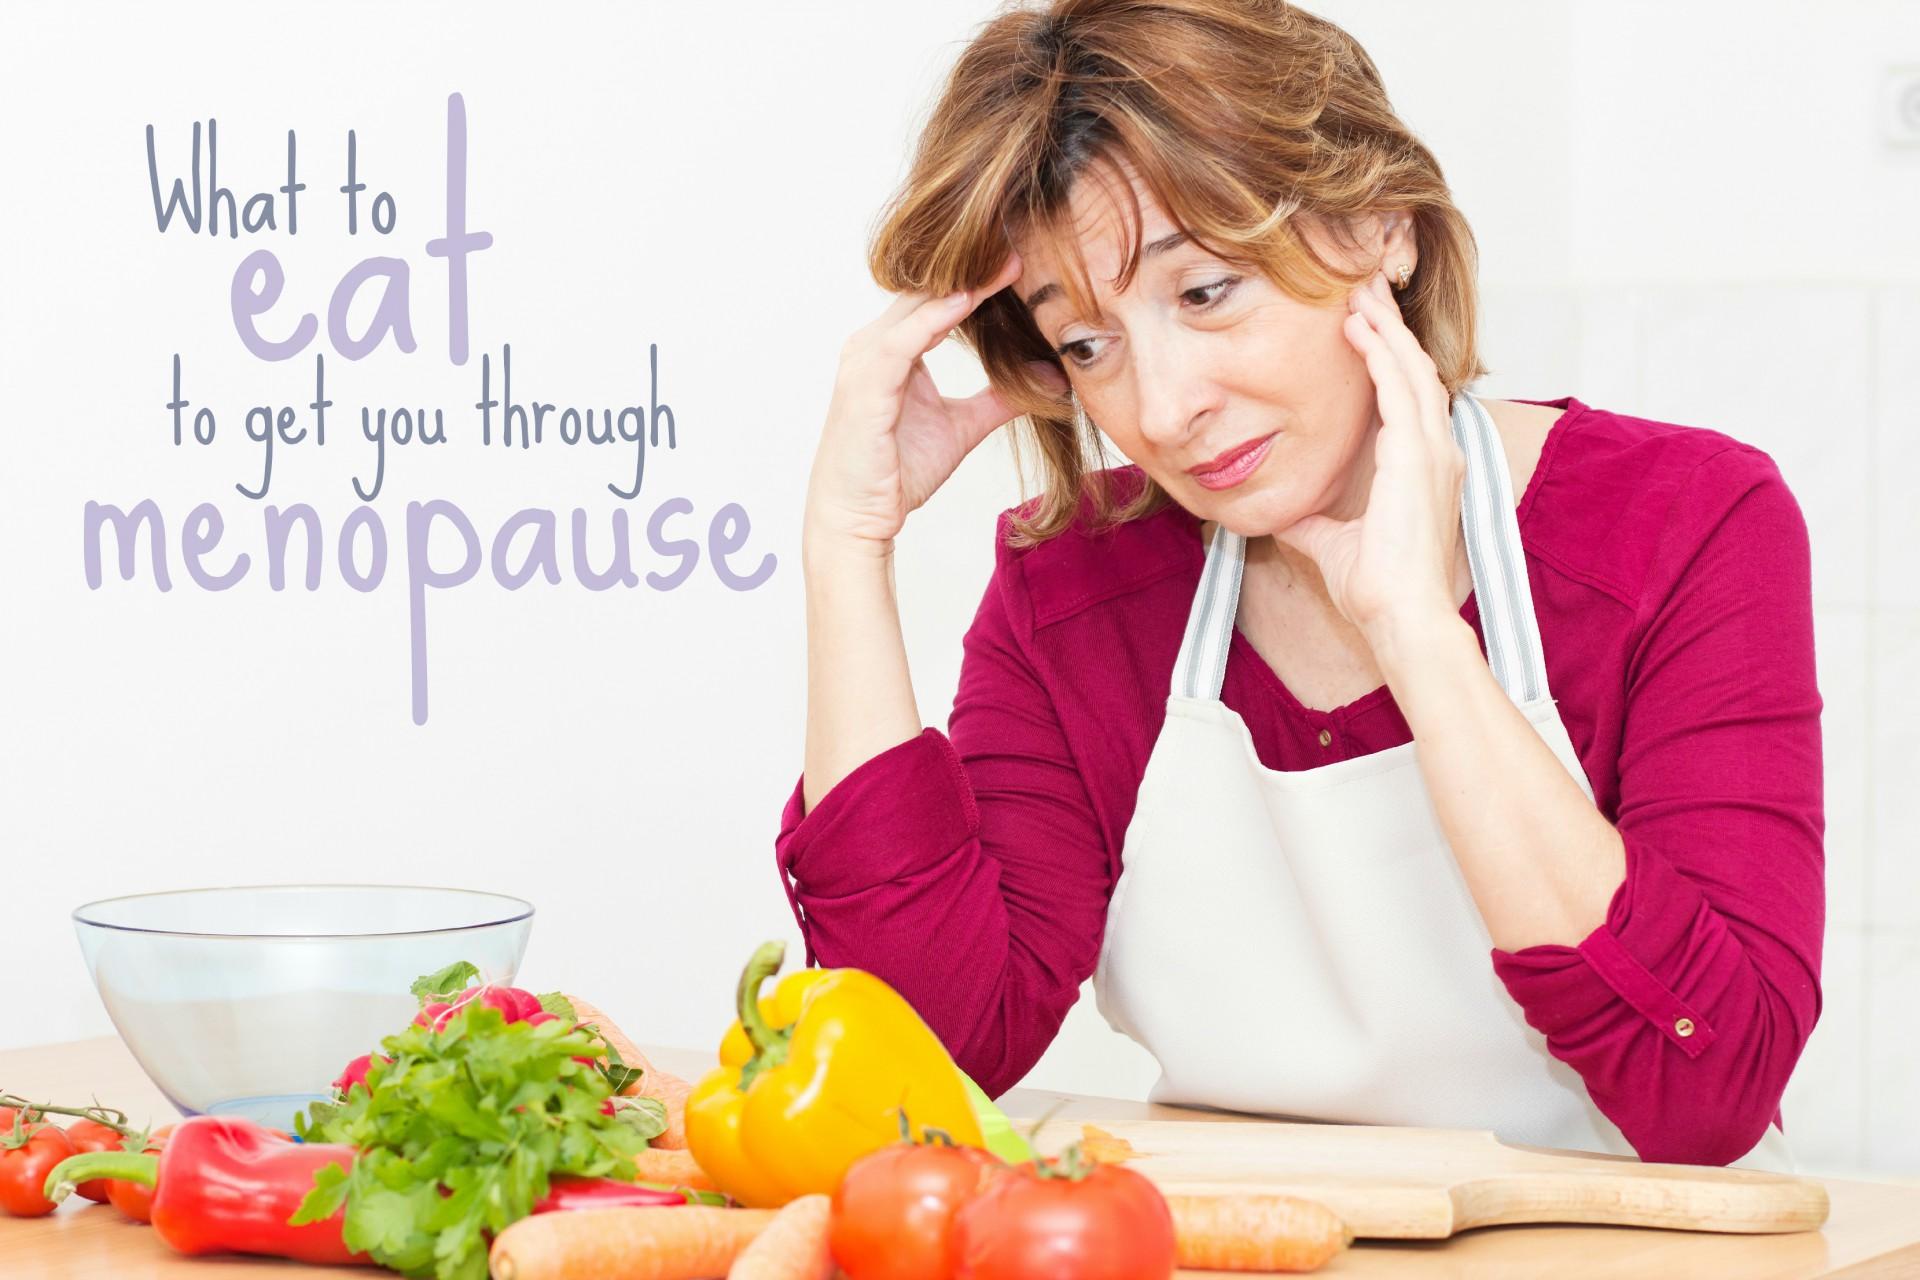 menopause-diet